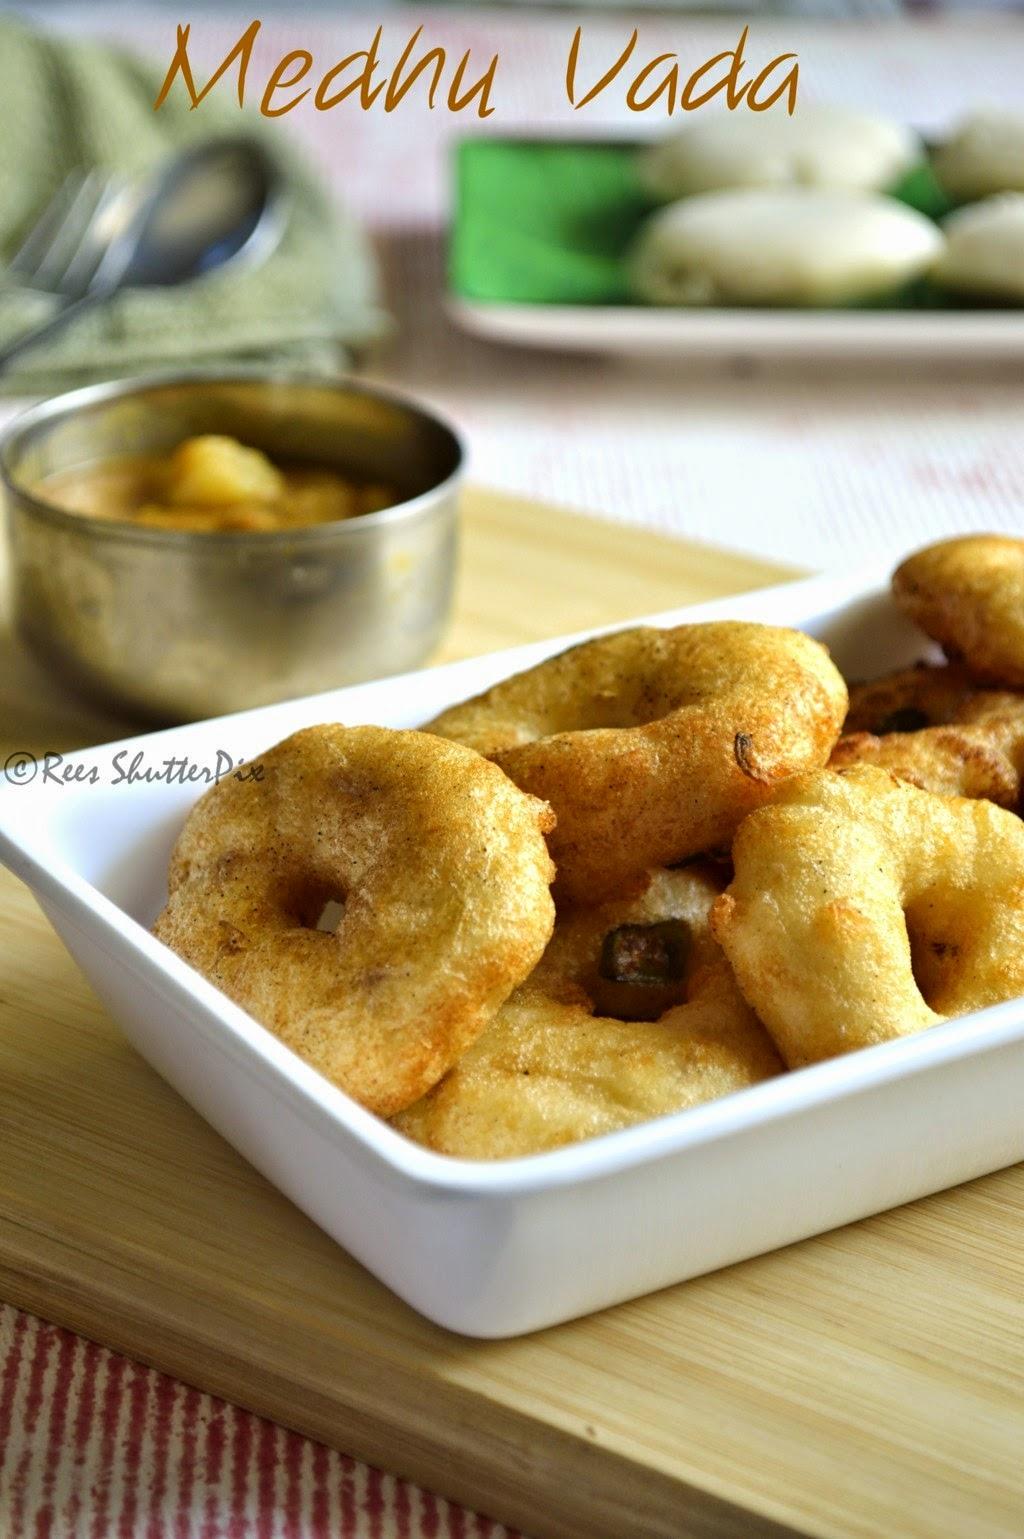 ulundu vada,medhu vadai recipe,ulundu vadai tips,ulundu vadai recipe with video,how to make medu vada step by step,how to make ulundu vada video,medu vada recipe,step by step ulundu vadai recipe, easy vada recipe, soft and crispy vada recipe, sambar vada recipe